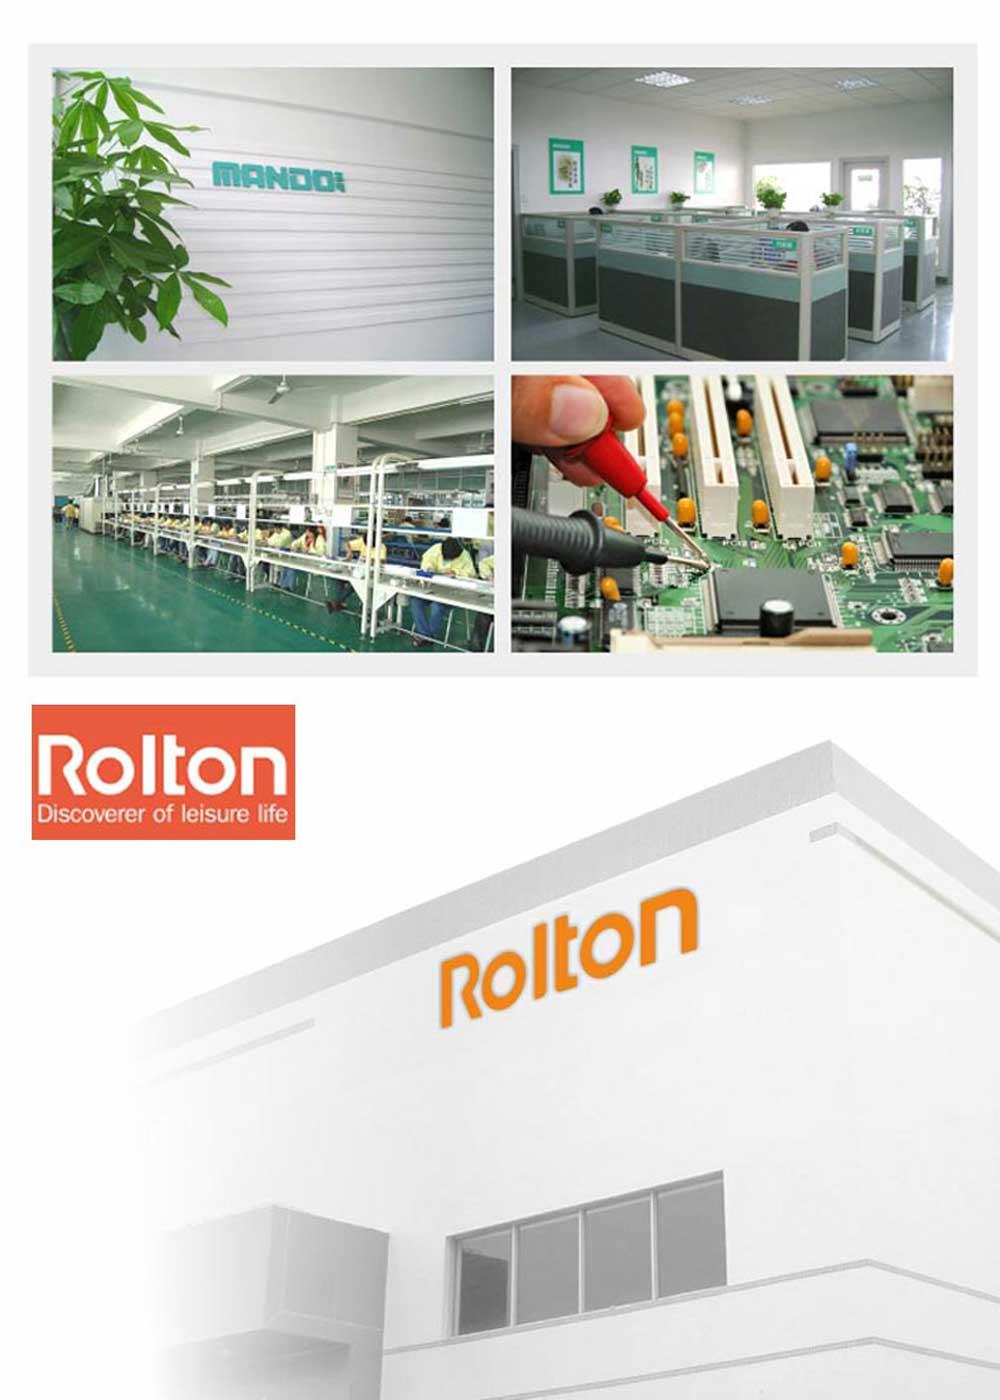 Rolton-01